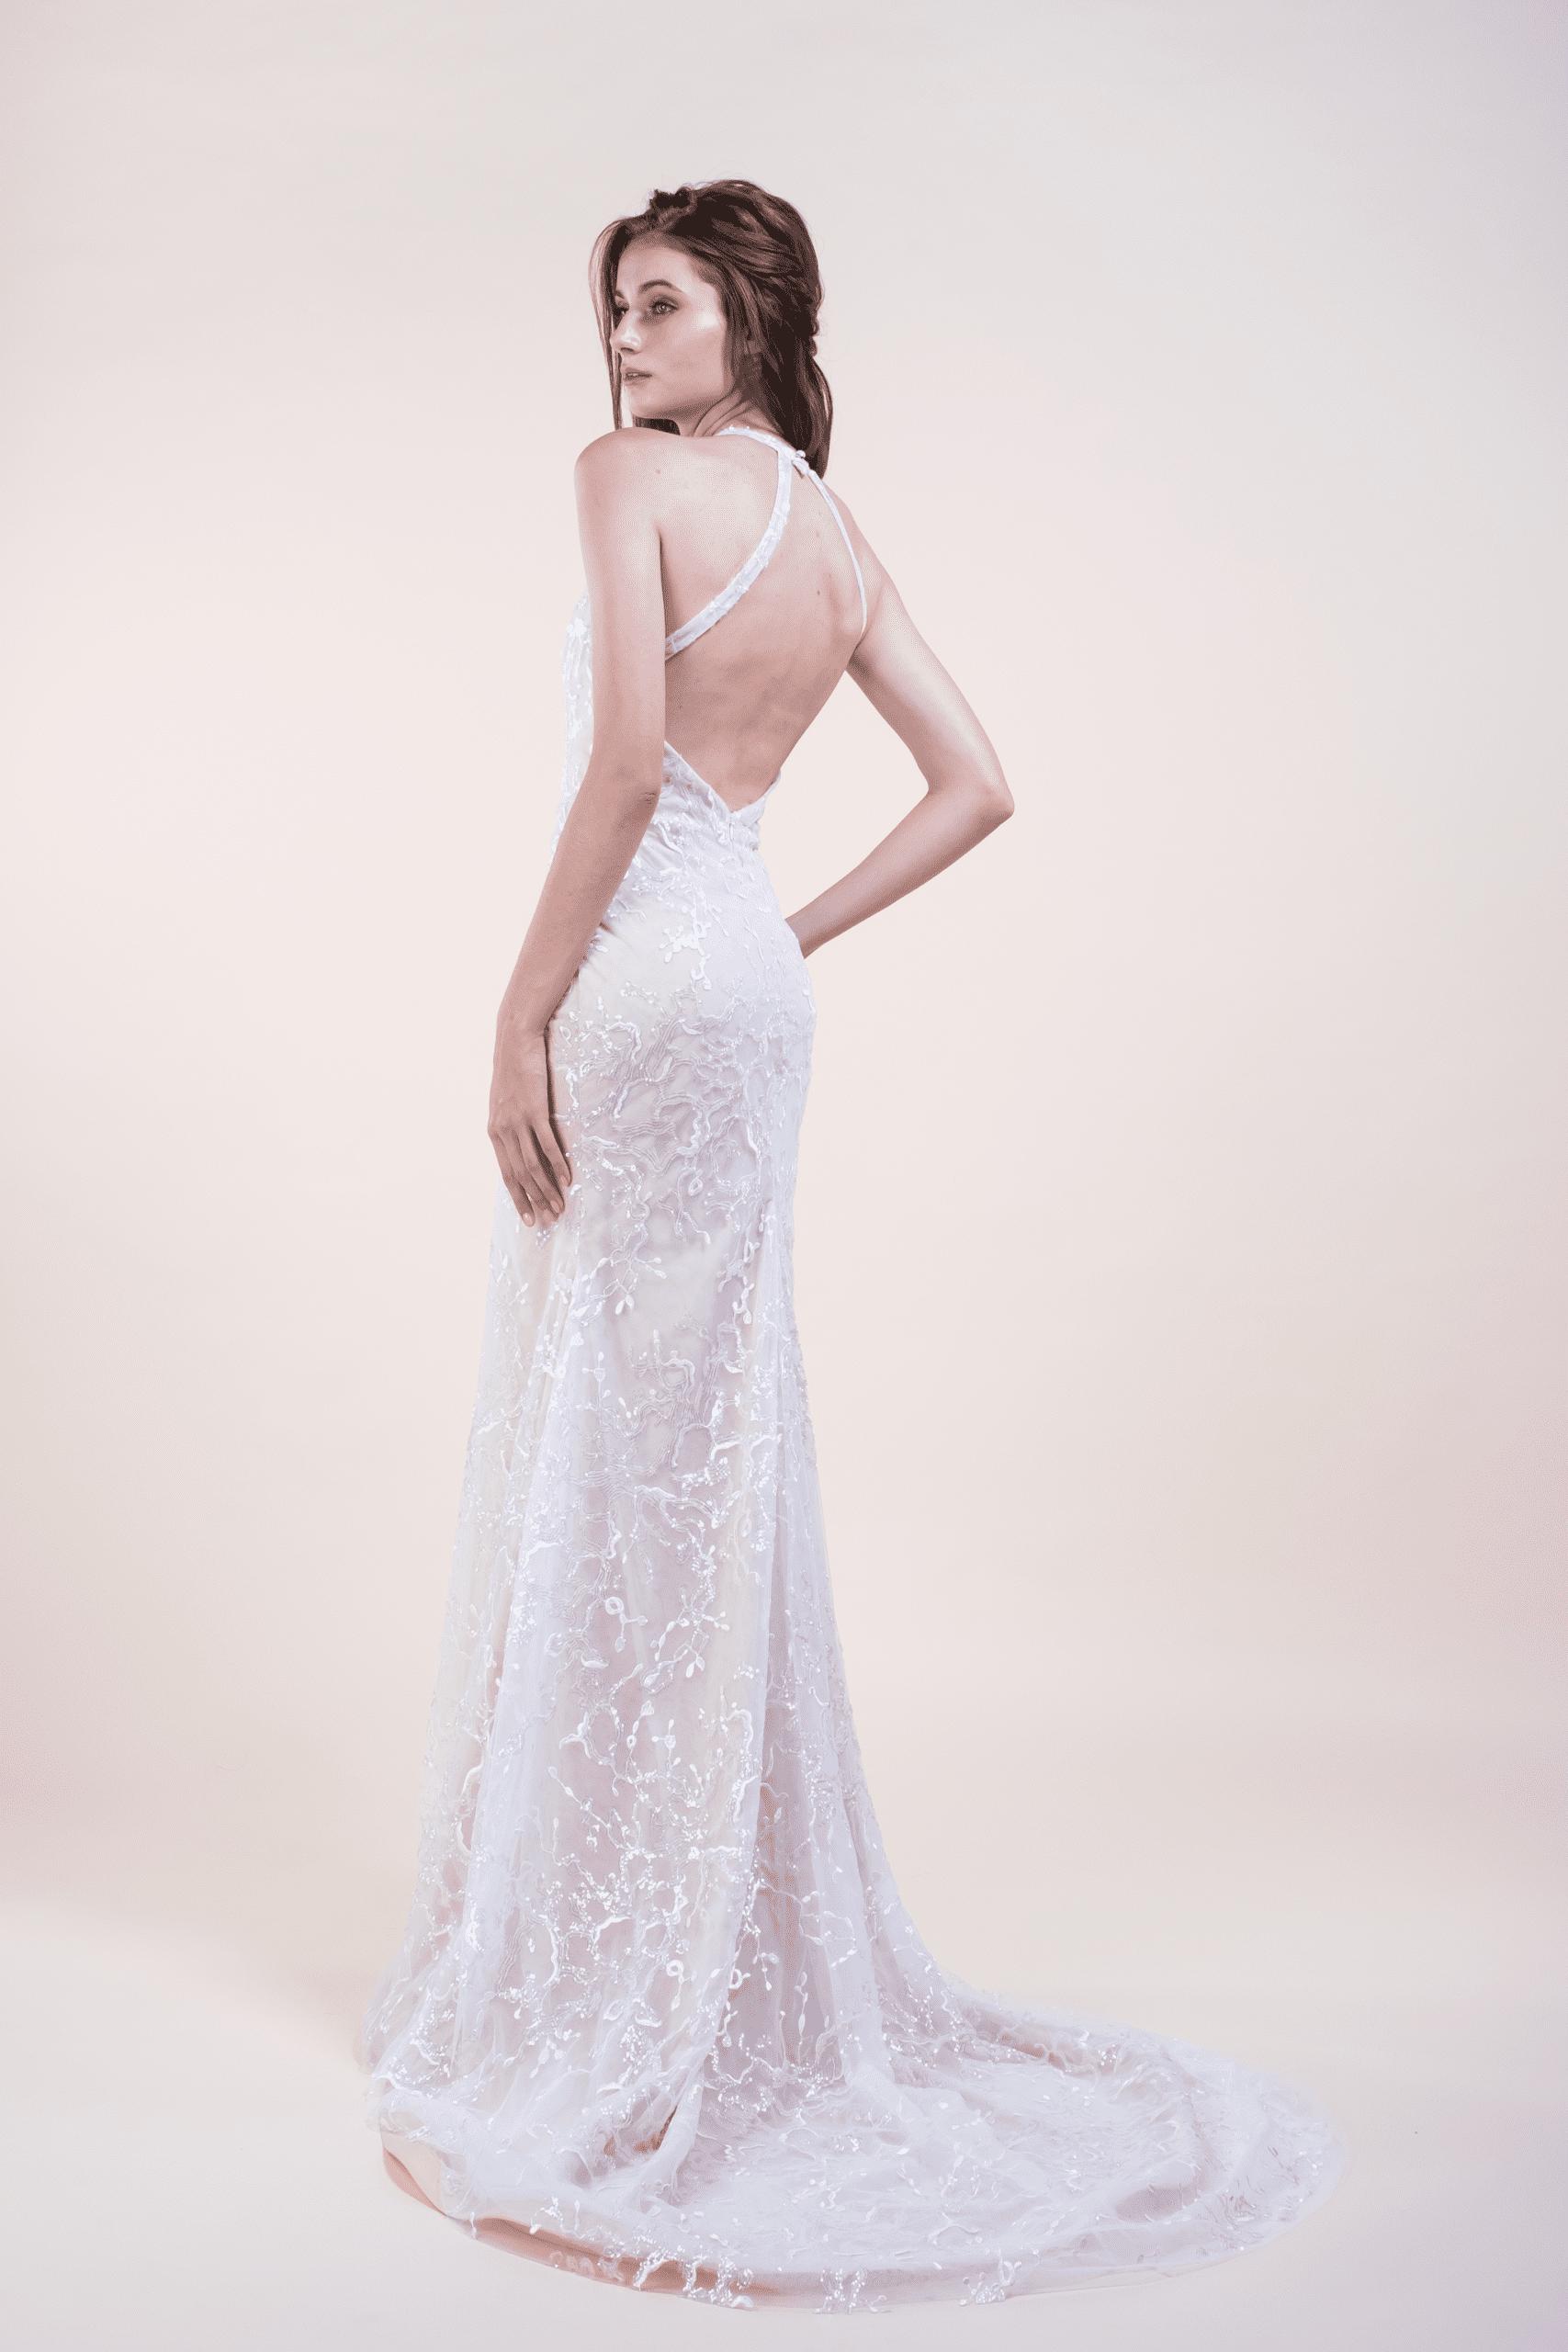 Lara-affordable-Bridal-Dress-for-rent-in-Singapore